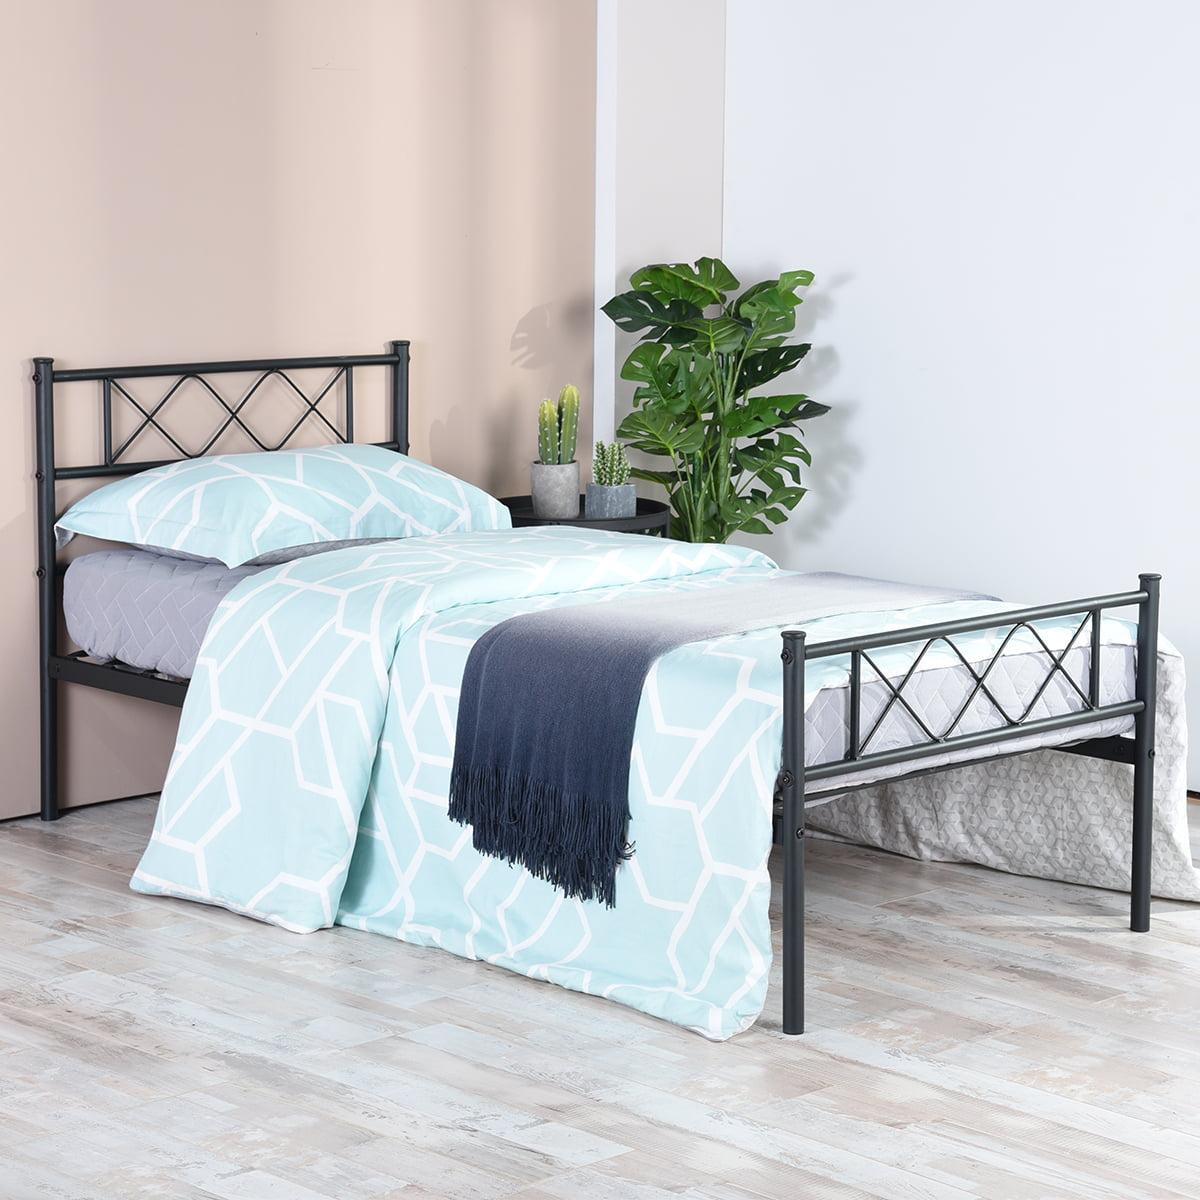 Teraves Metal Bed Frame Platform Mattress Foundation With Headboard Under Bed Storage Multiple Size Walmart Com Walmart Com